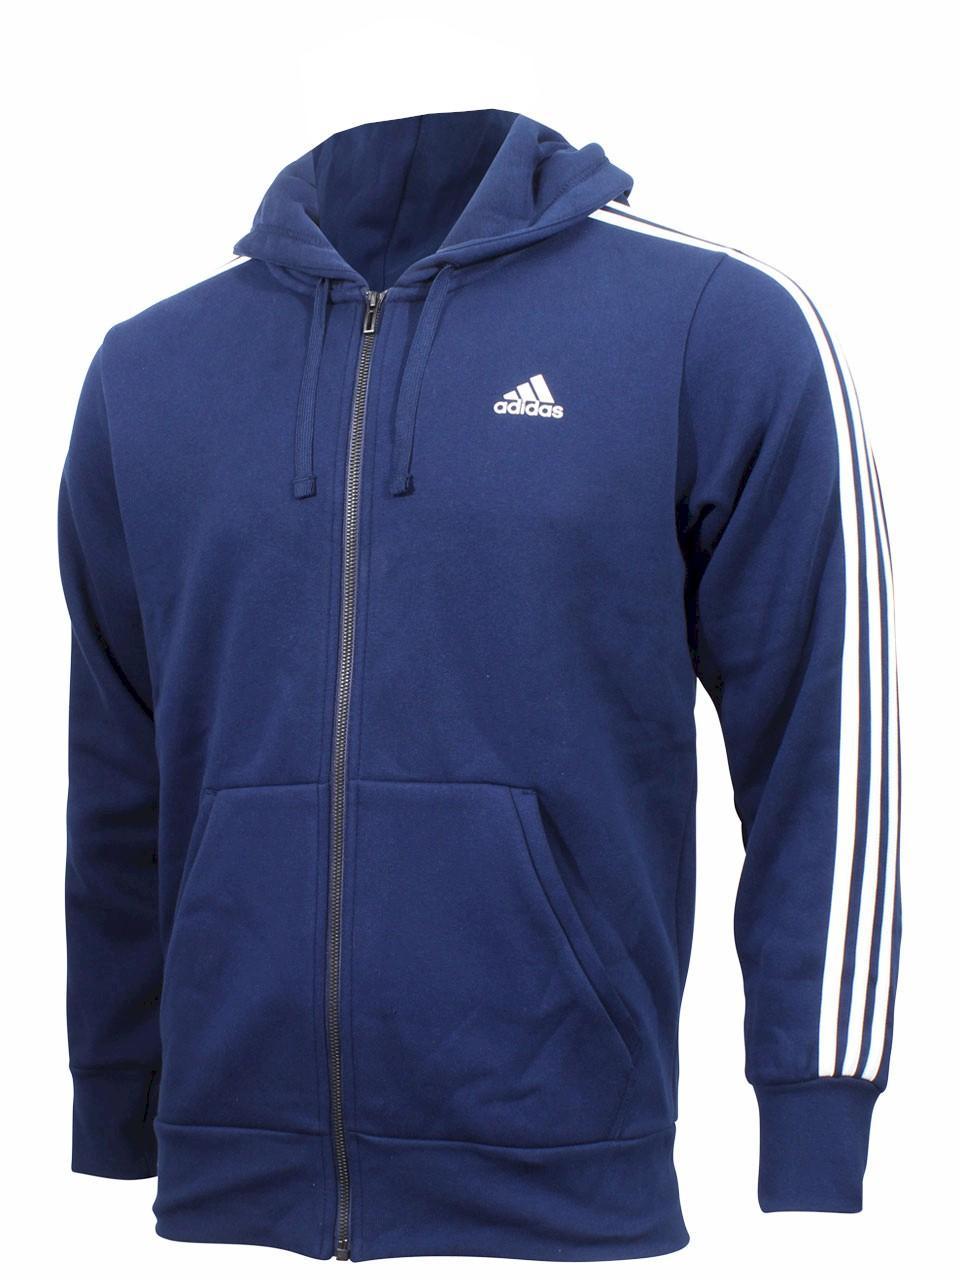 Adidas Men's Essentials 3-Stripes Long Sleeve Full Zip Fleece Hoodie Jacket